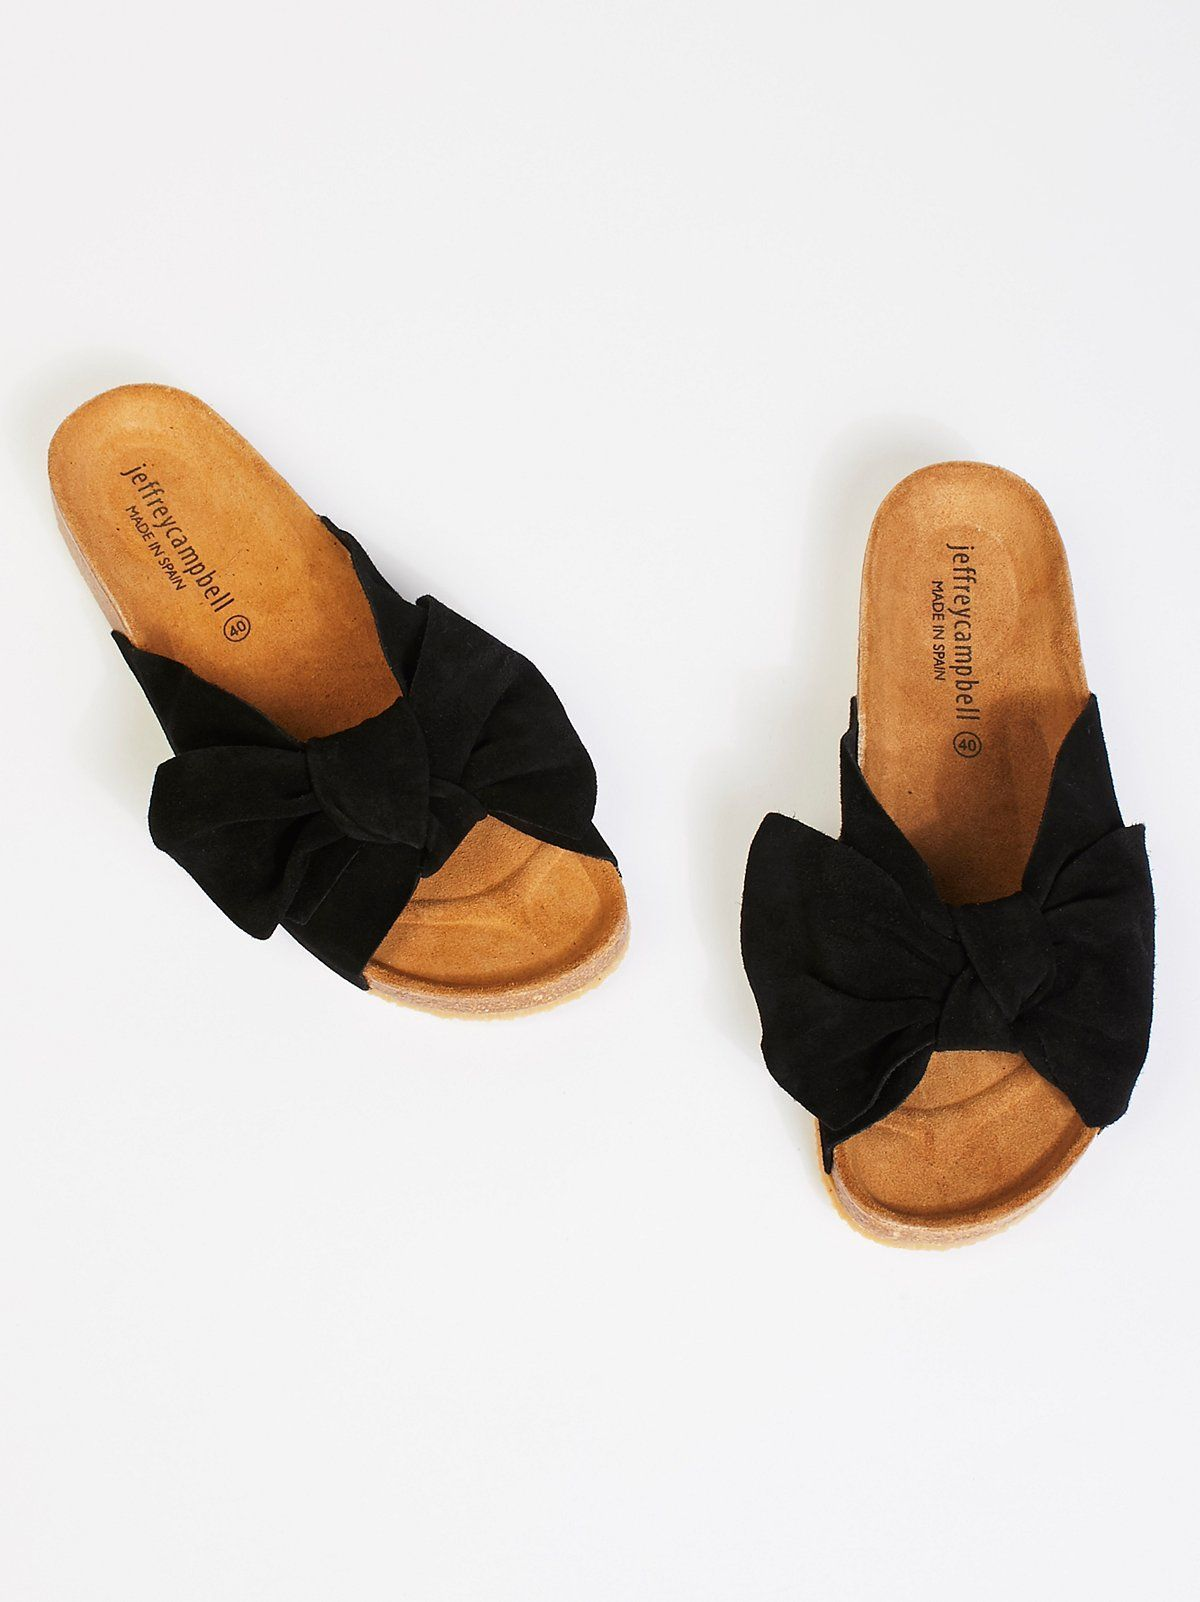 Sandals summer, Sandals heels, Summer shoes